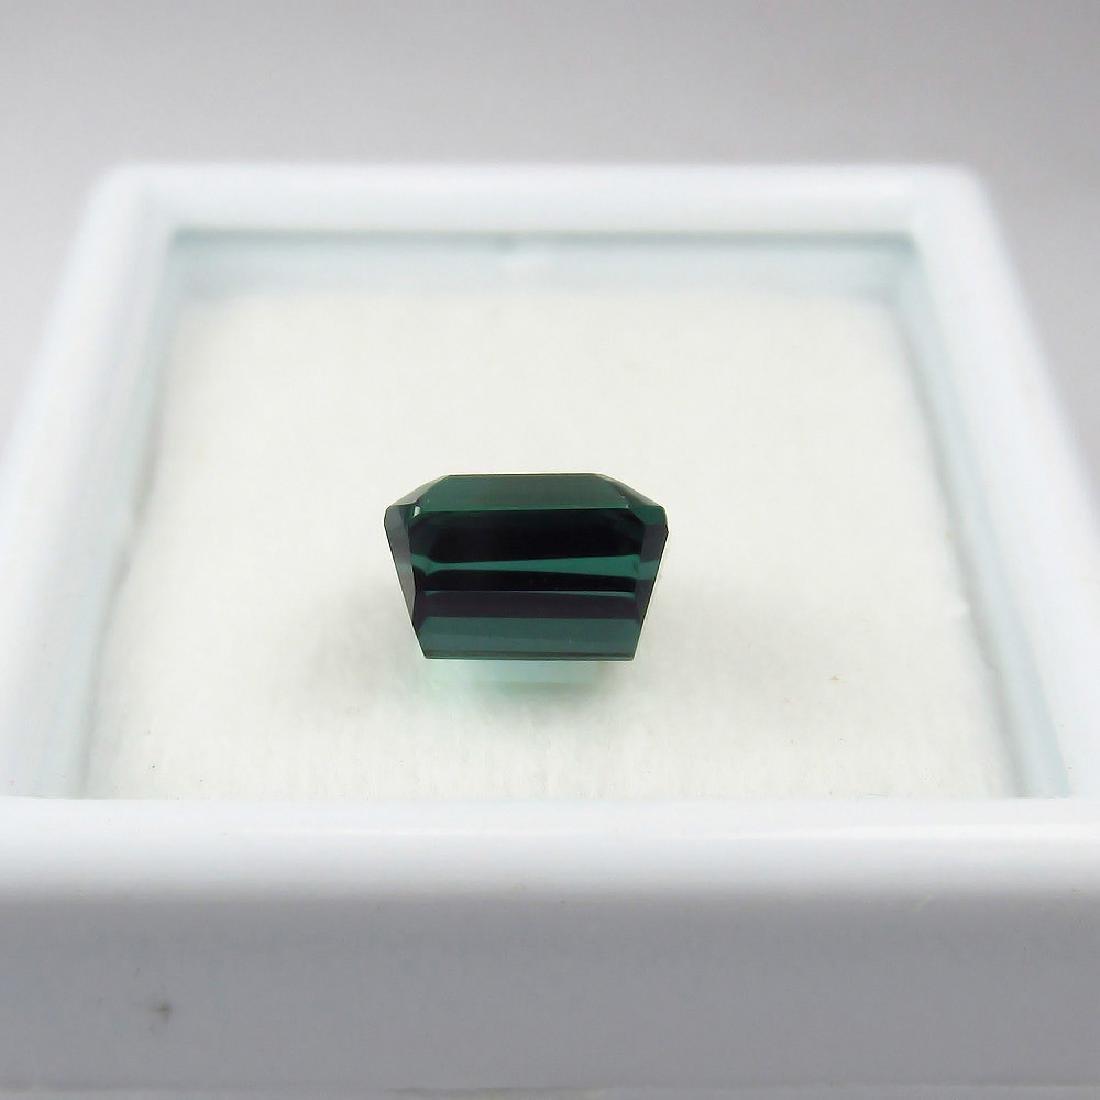 1.55 Ct Genuine Loose Green Tourmaline Full Luster - 3